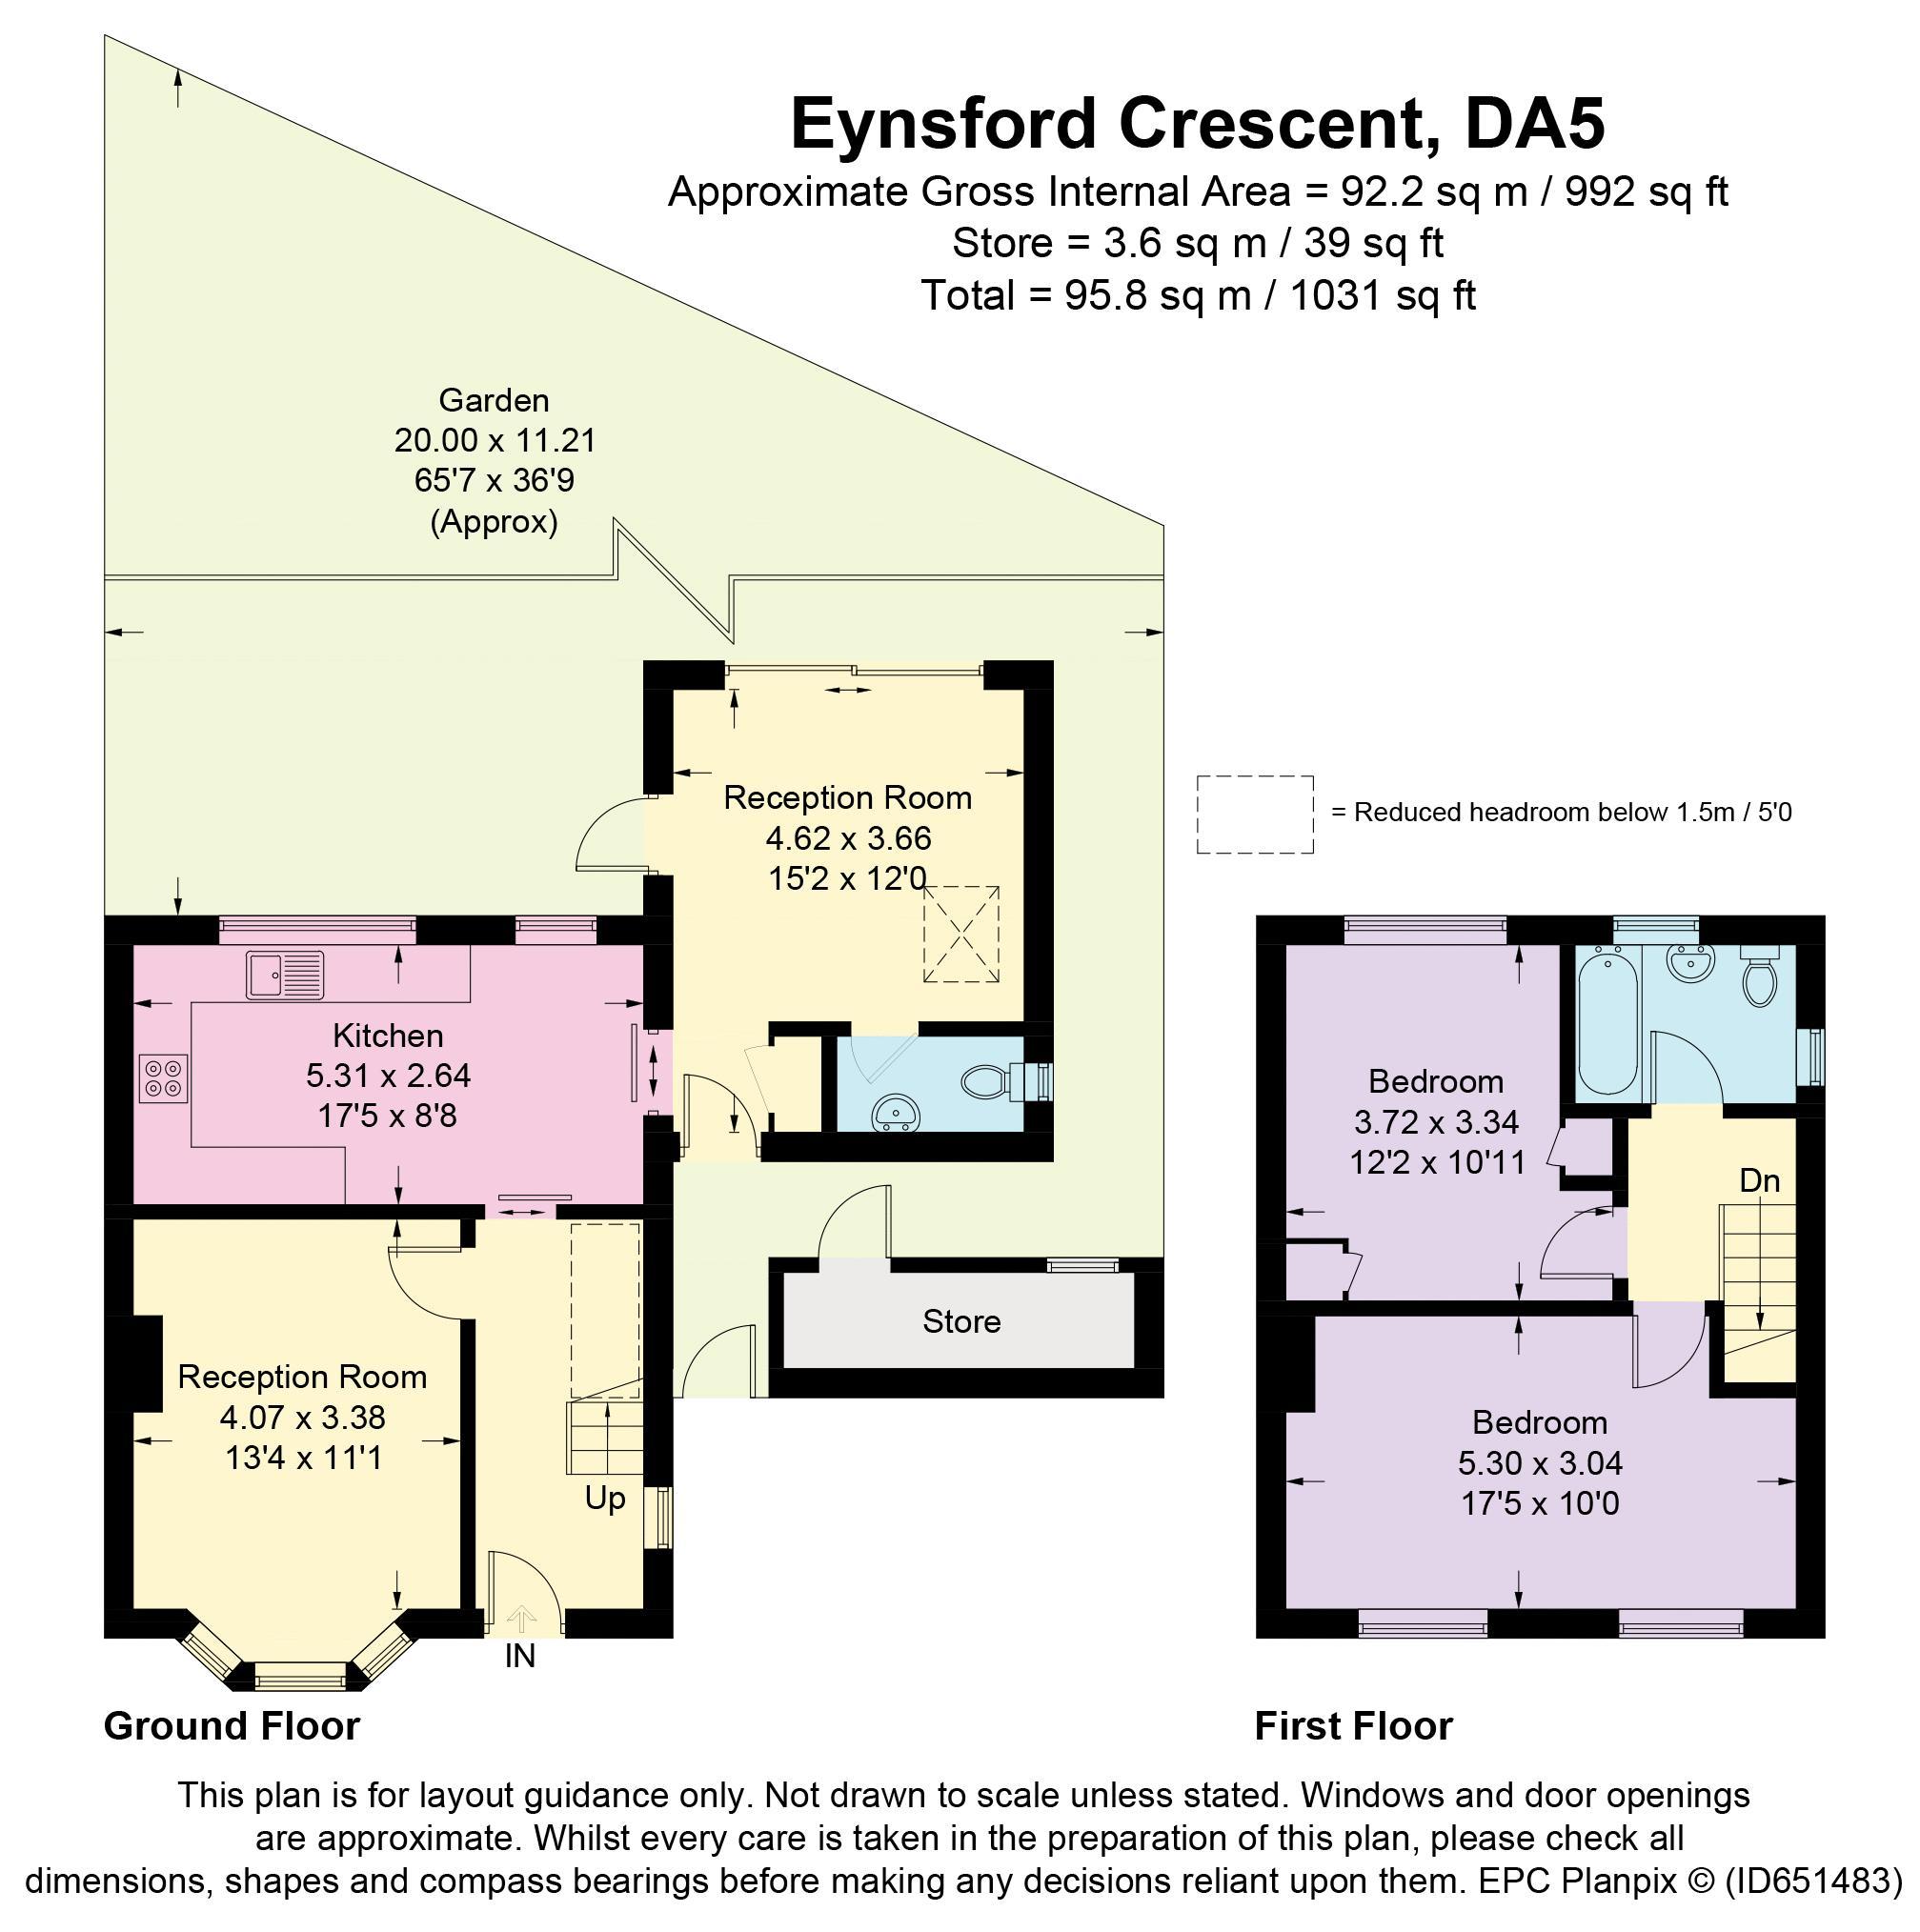 47 Eynsford Crescent